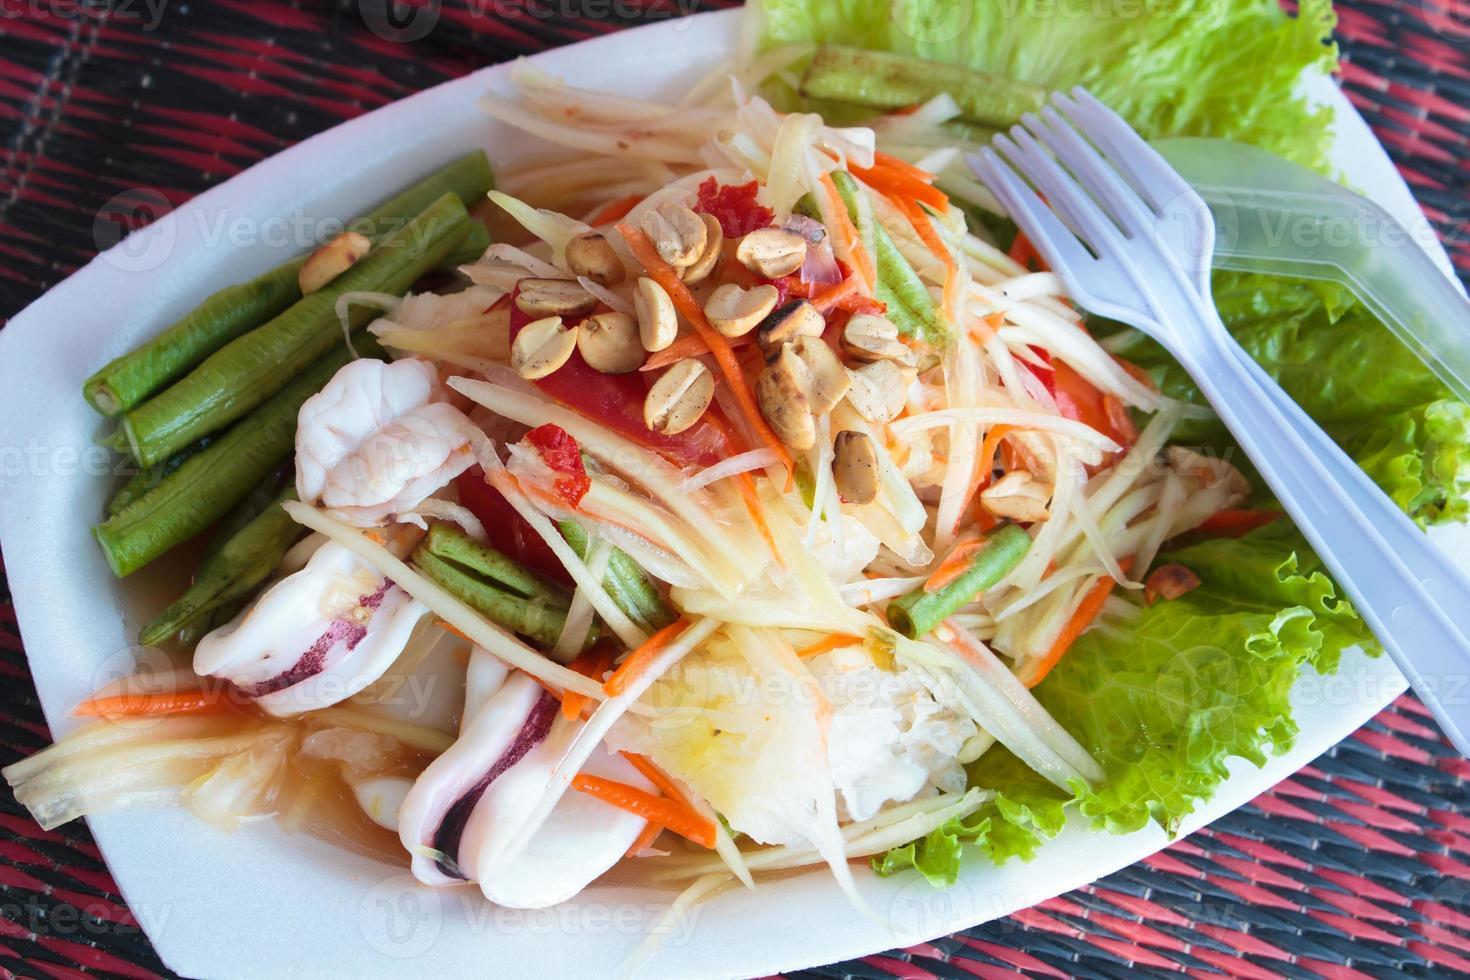 salade de papaye fruits de mer, cuisine thaïlandaise. photo